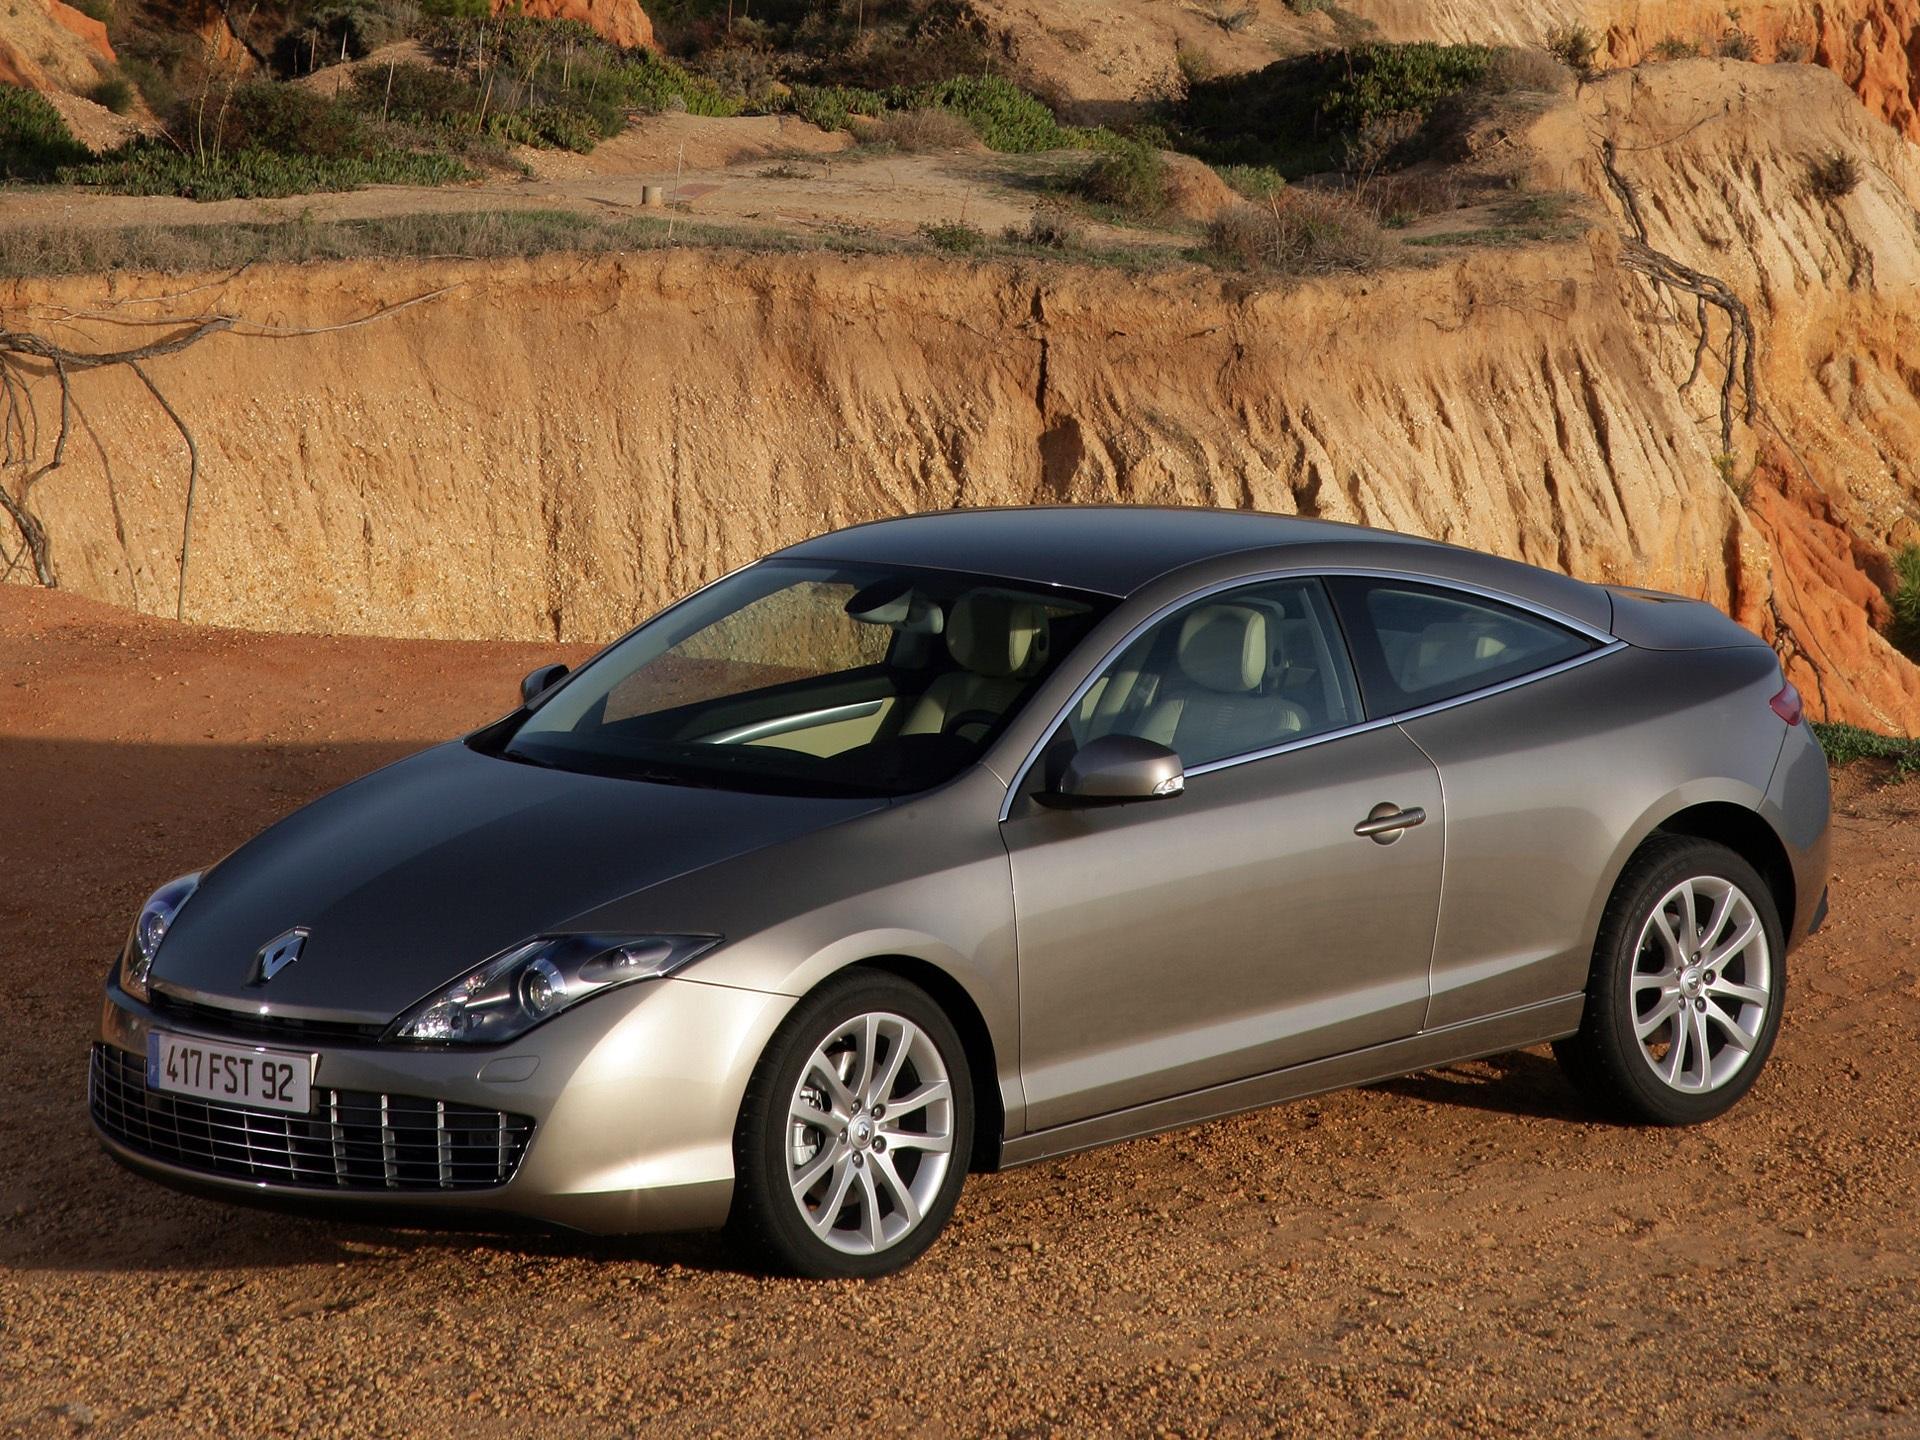 Renault Lagune